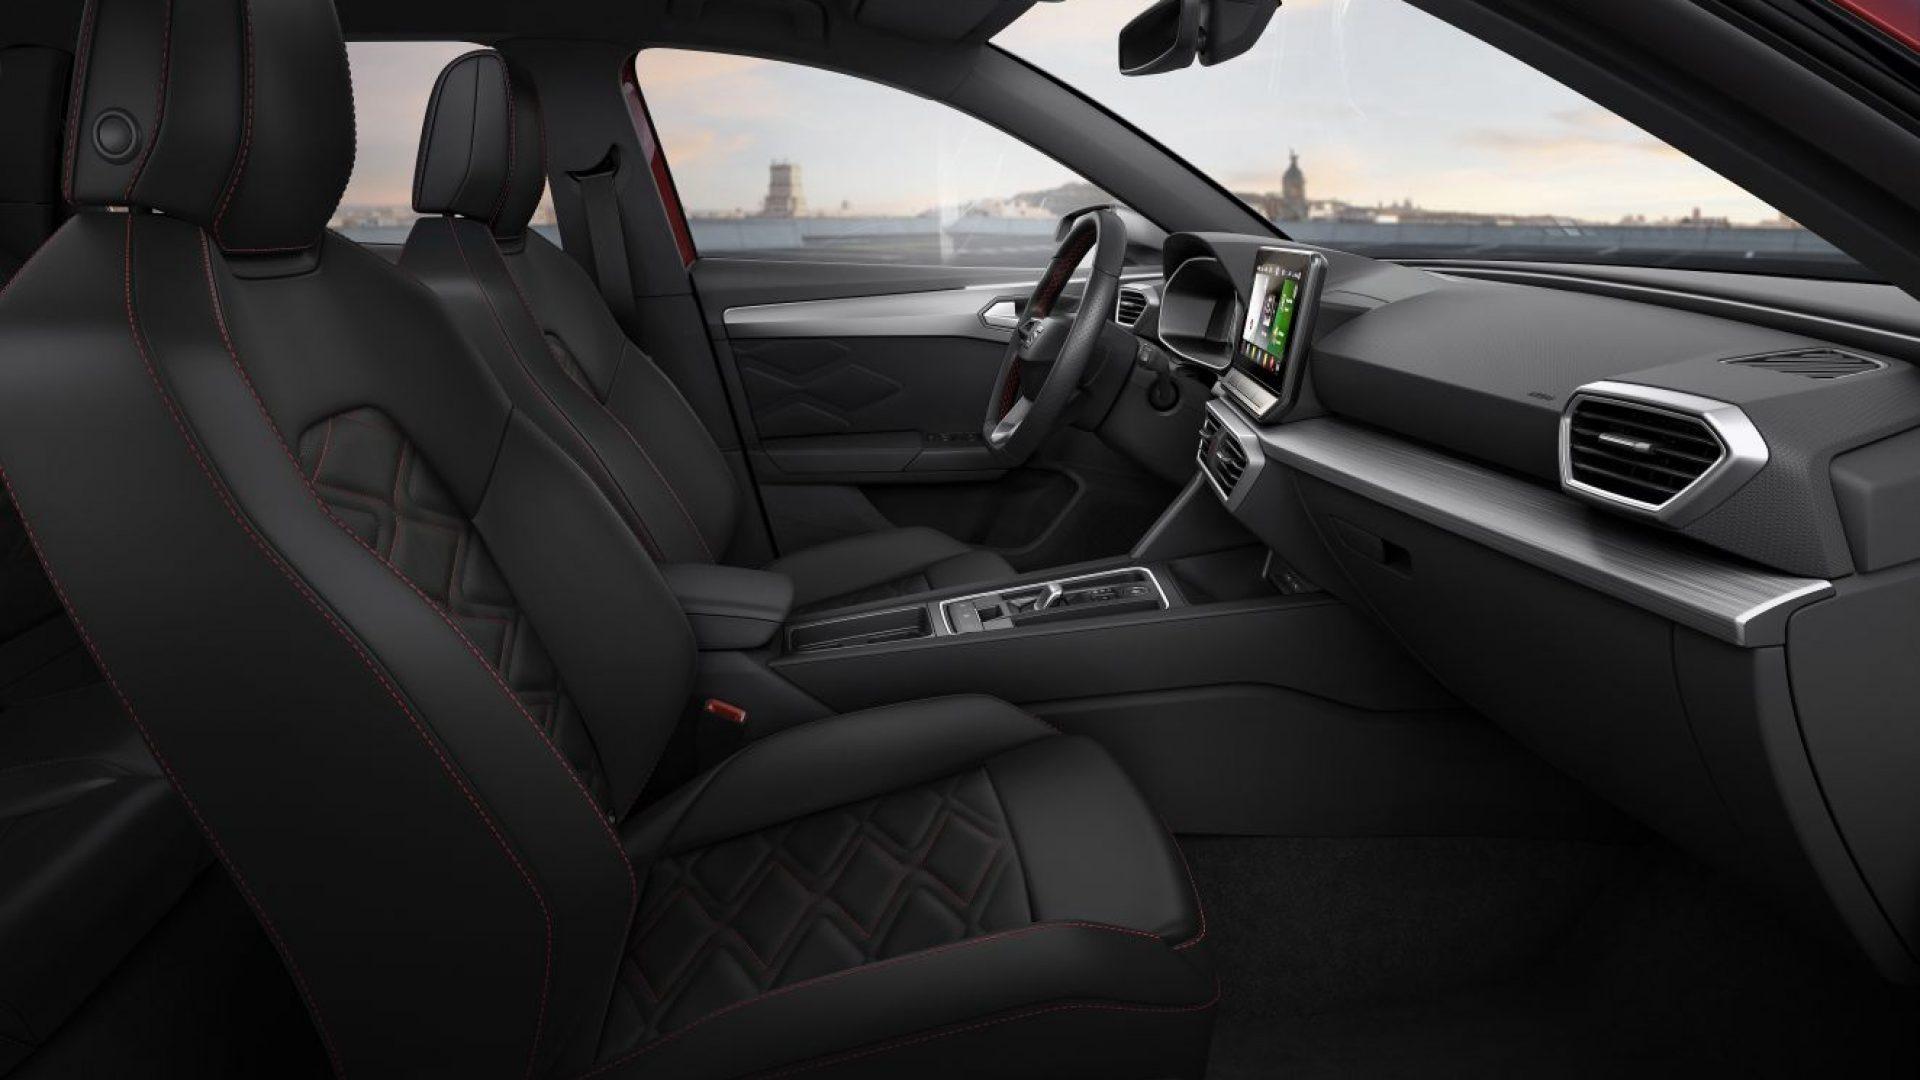 All-new-SEAT-Leon-5-doors_13_HQ